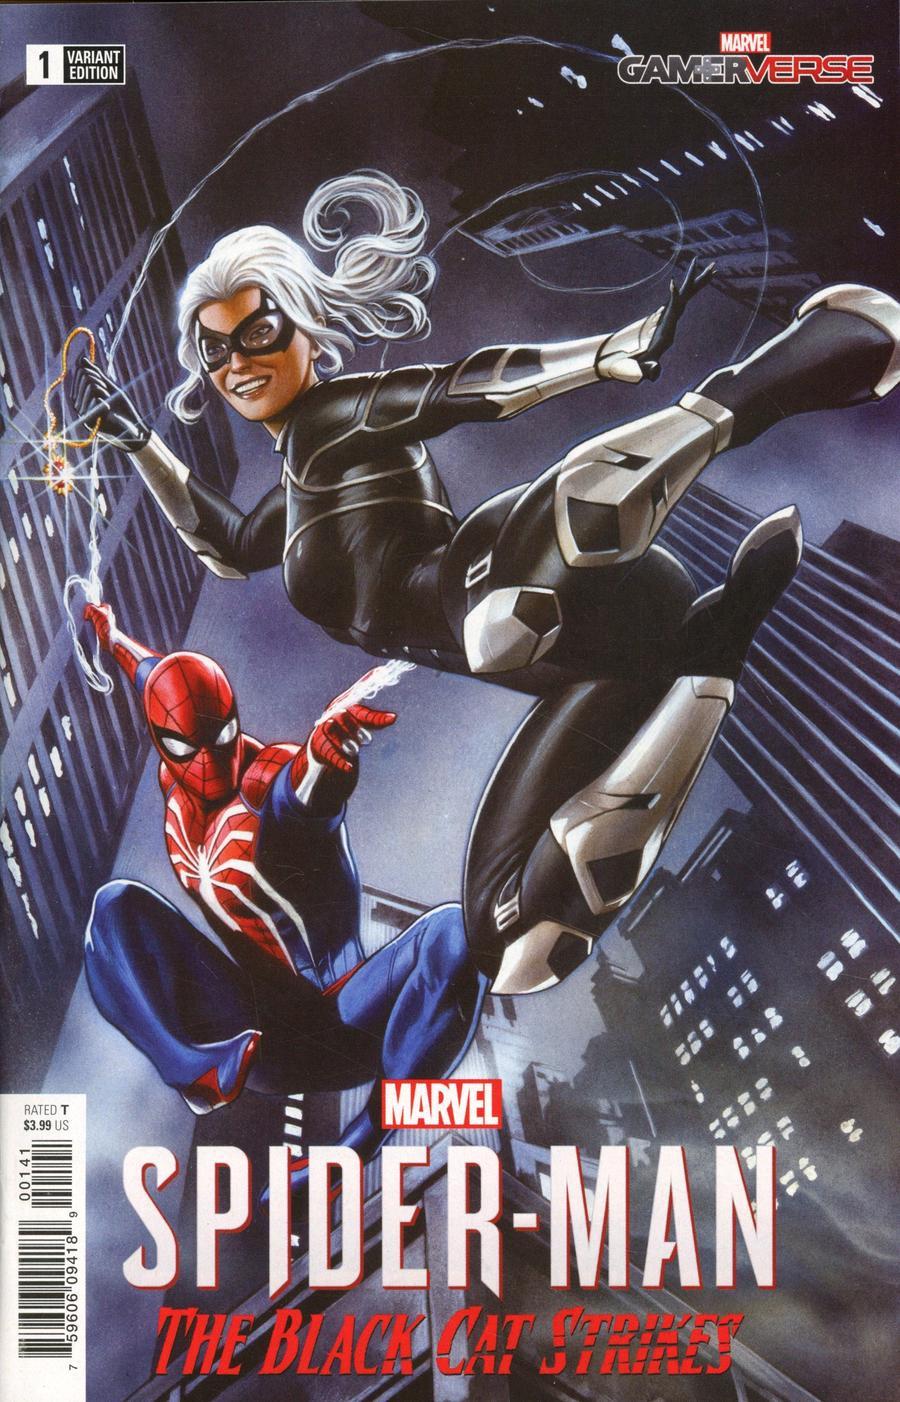 Marvels Spider-Man Black Cat Strikes #1 Cover C Incentive Adi Granov Game Variant Cover